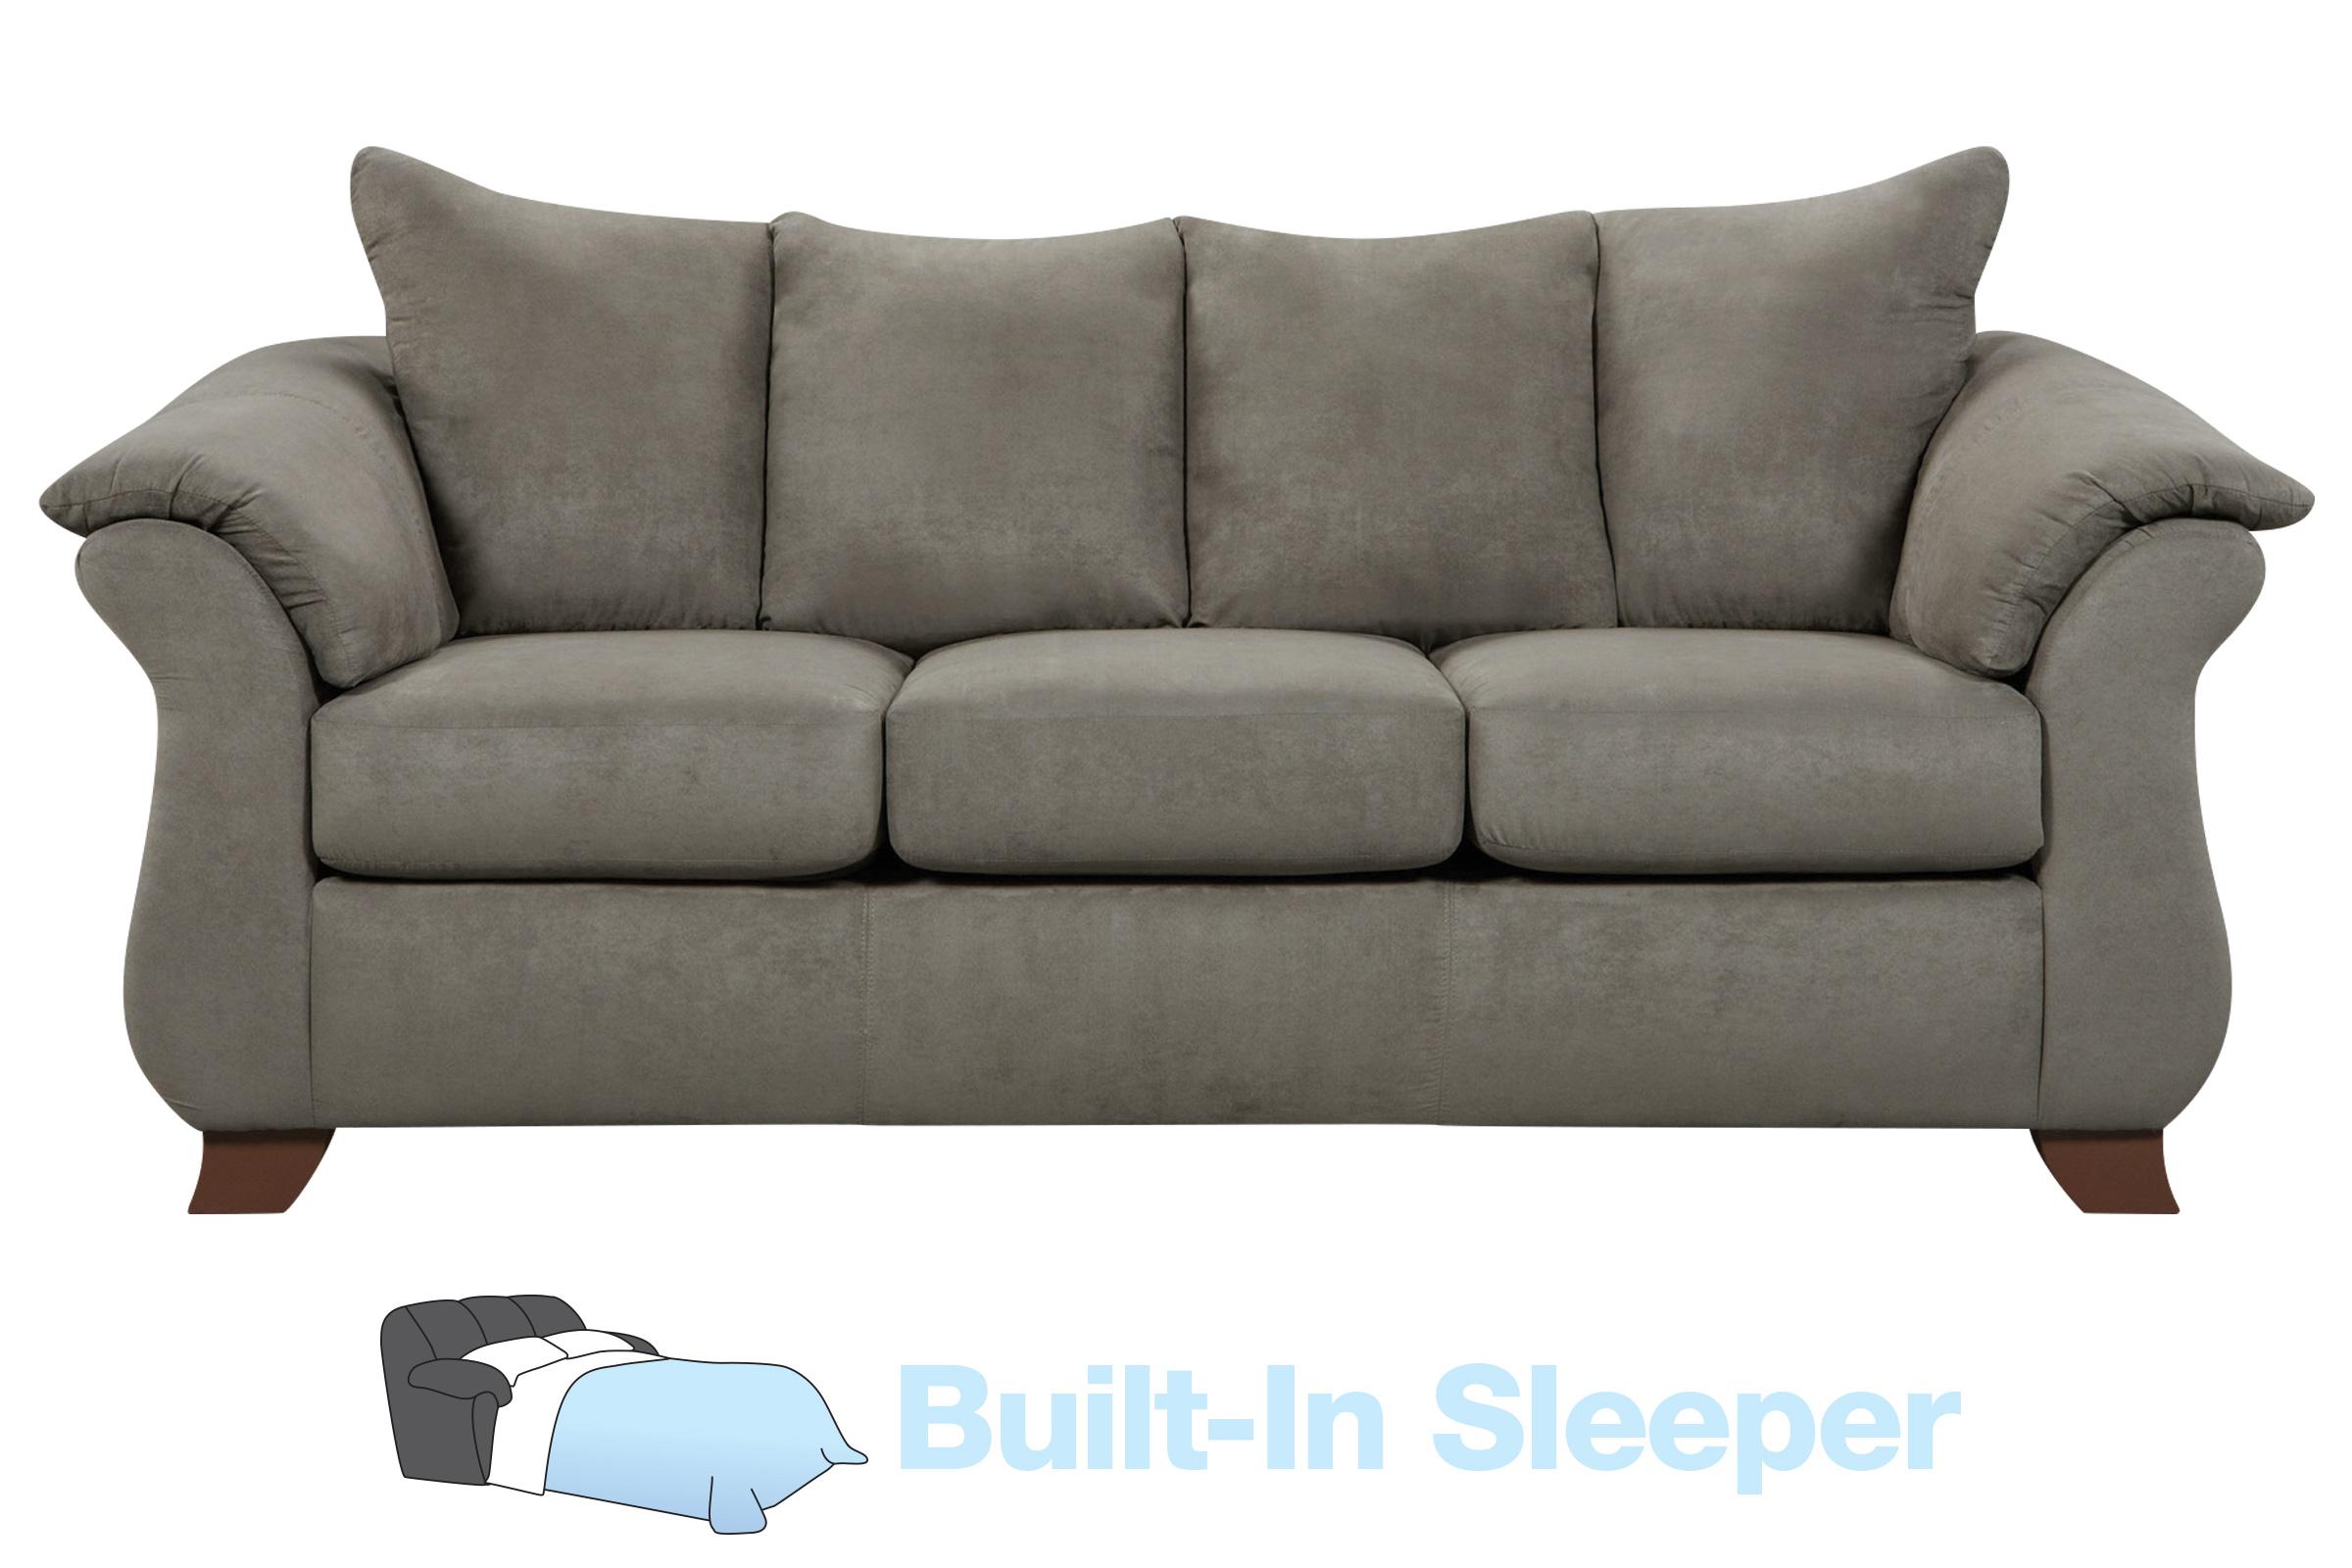 - Upton Microfiber Queen Sleeper Sofa At Gardner-White